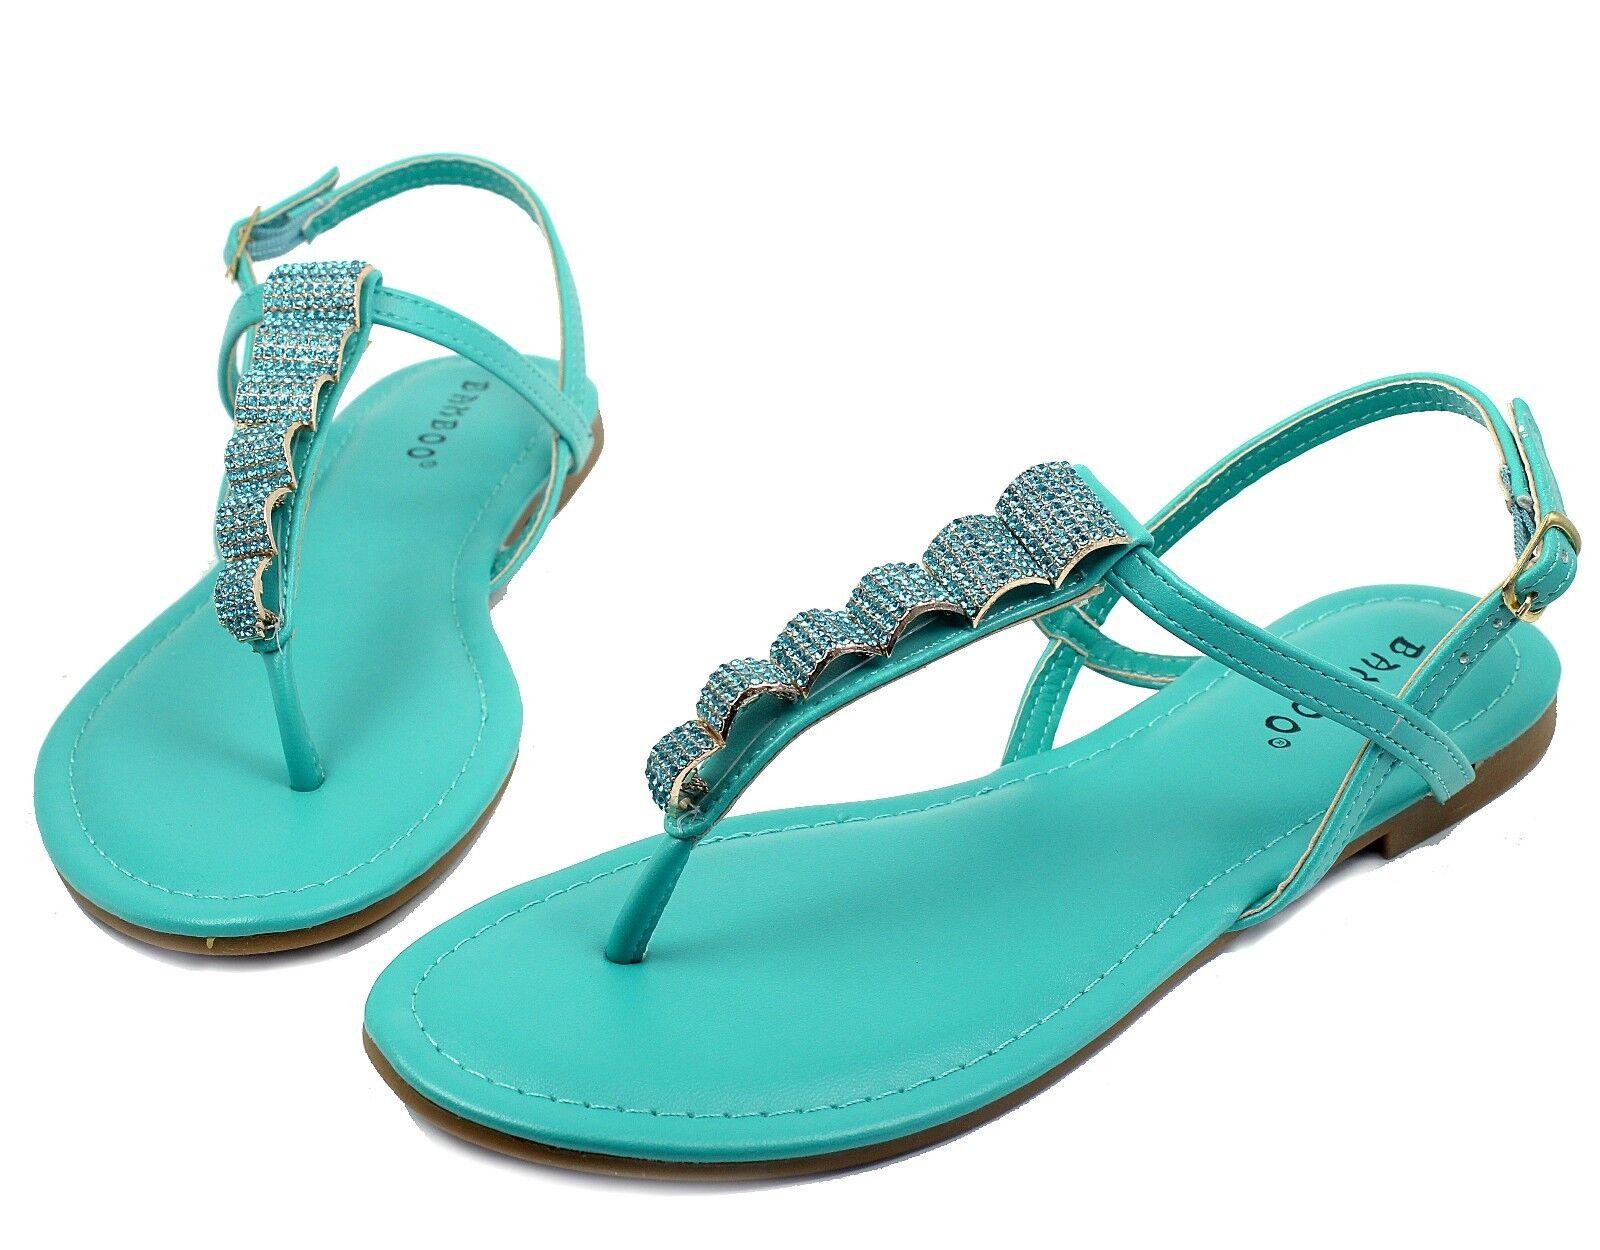 Josalyn-19 Party Precious Stone Flats Sandals Gladiator Party Josalyn-19 Women Shoes Mint 5.5 65a643